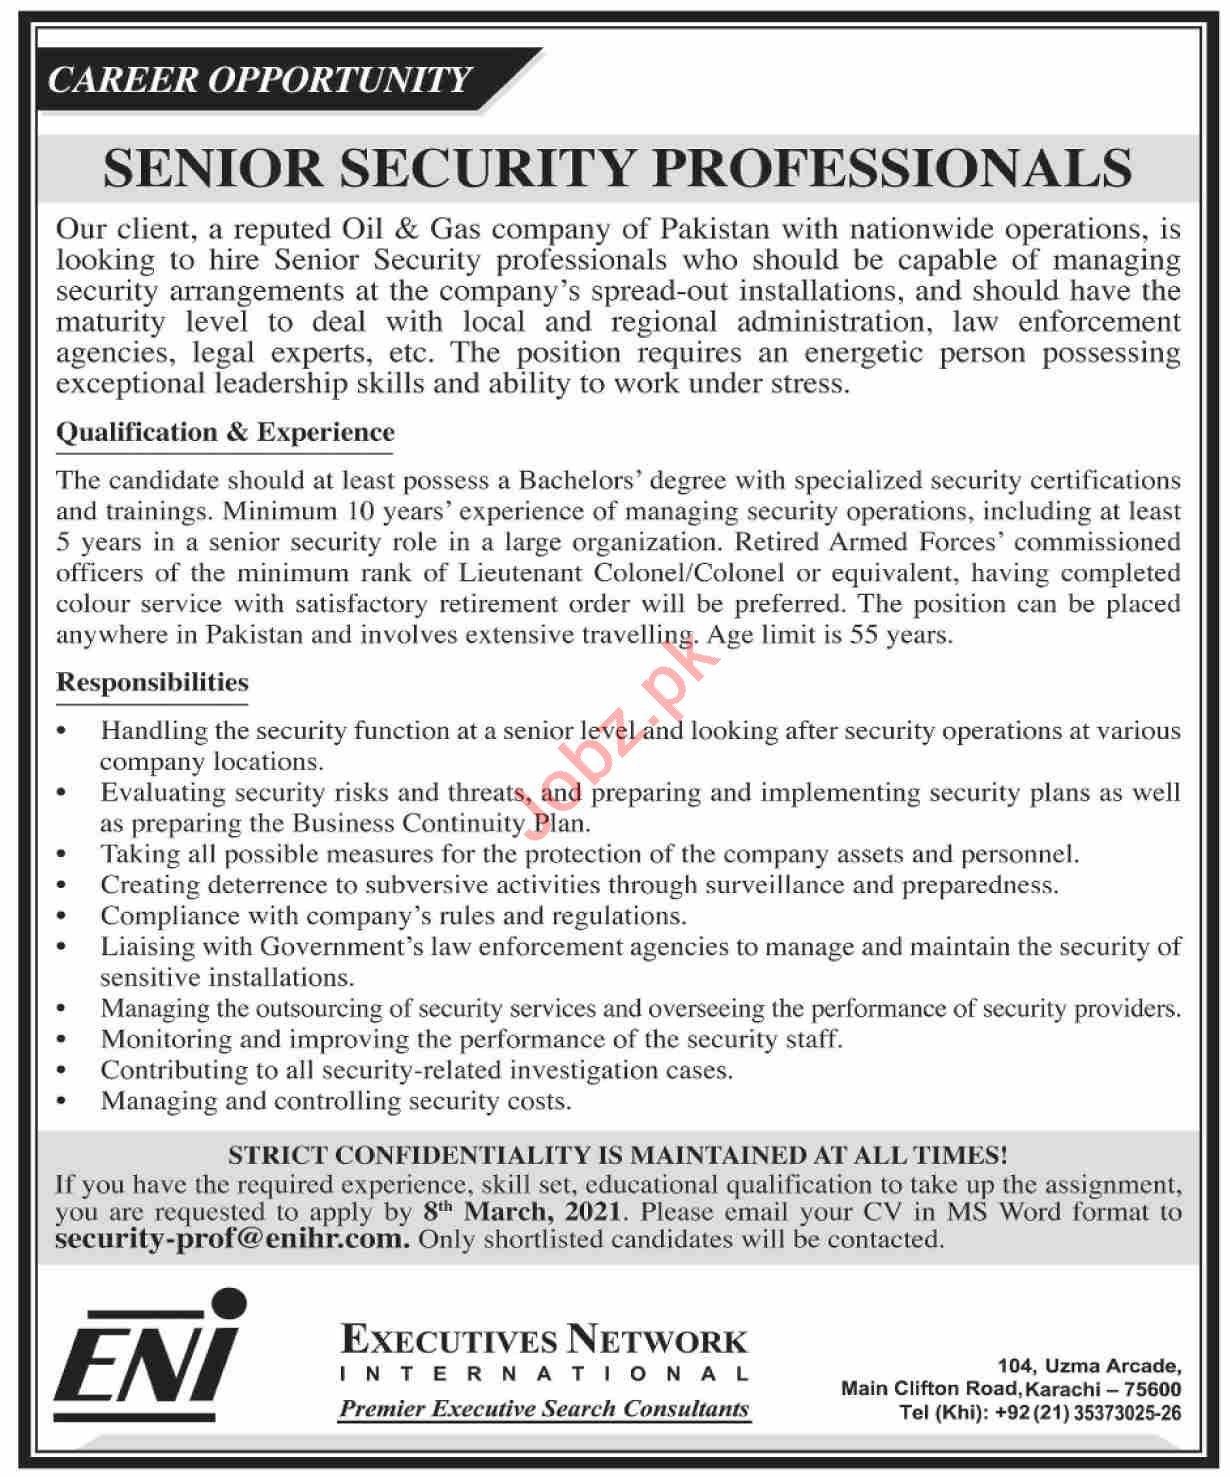 Senior Security Professional Jobs 2021 in Karachi